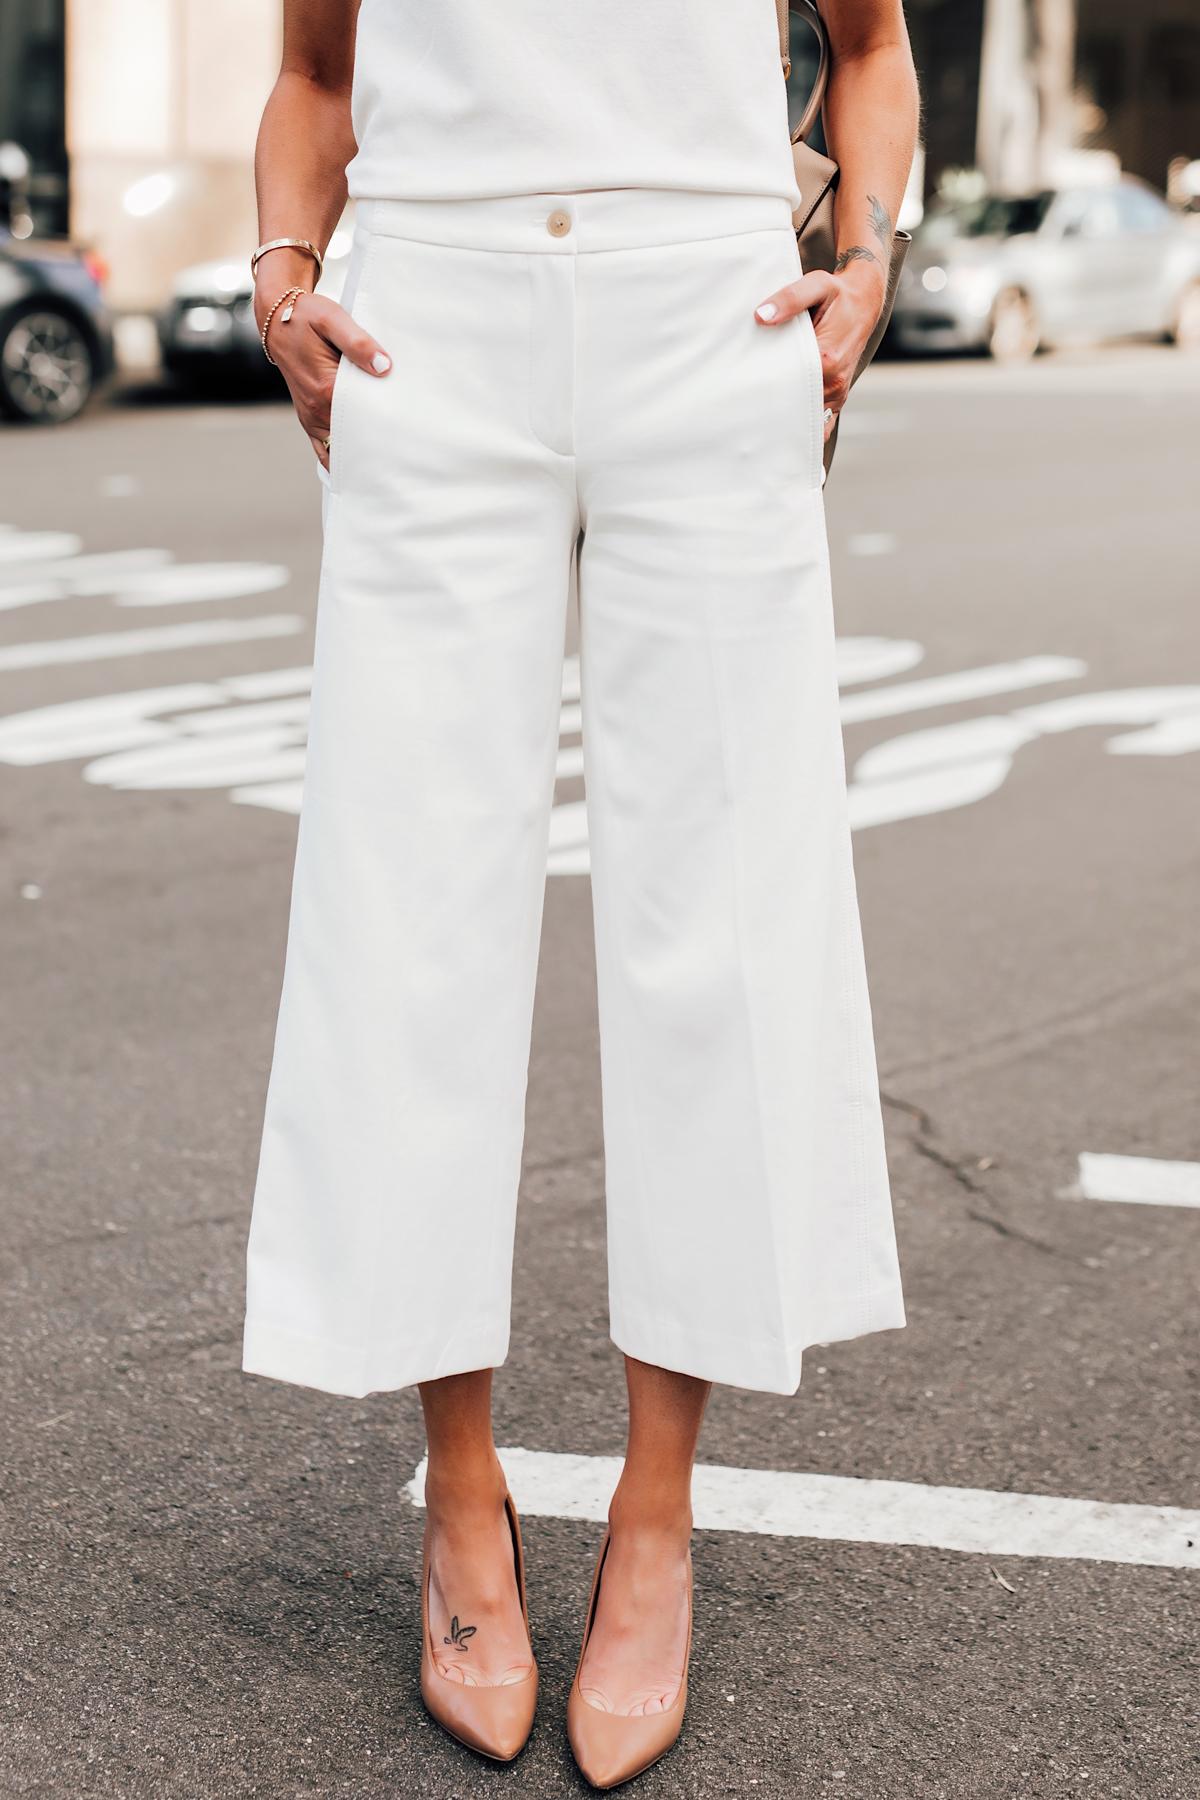 Woman Wearing Ann Taylor White Wide Leg Cropped Pants Nude Pumps Fashion Jackson San Diego Fashion Blogger Street Style